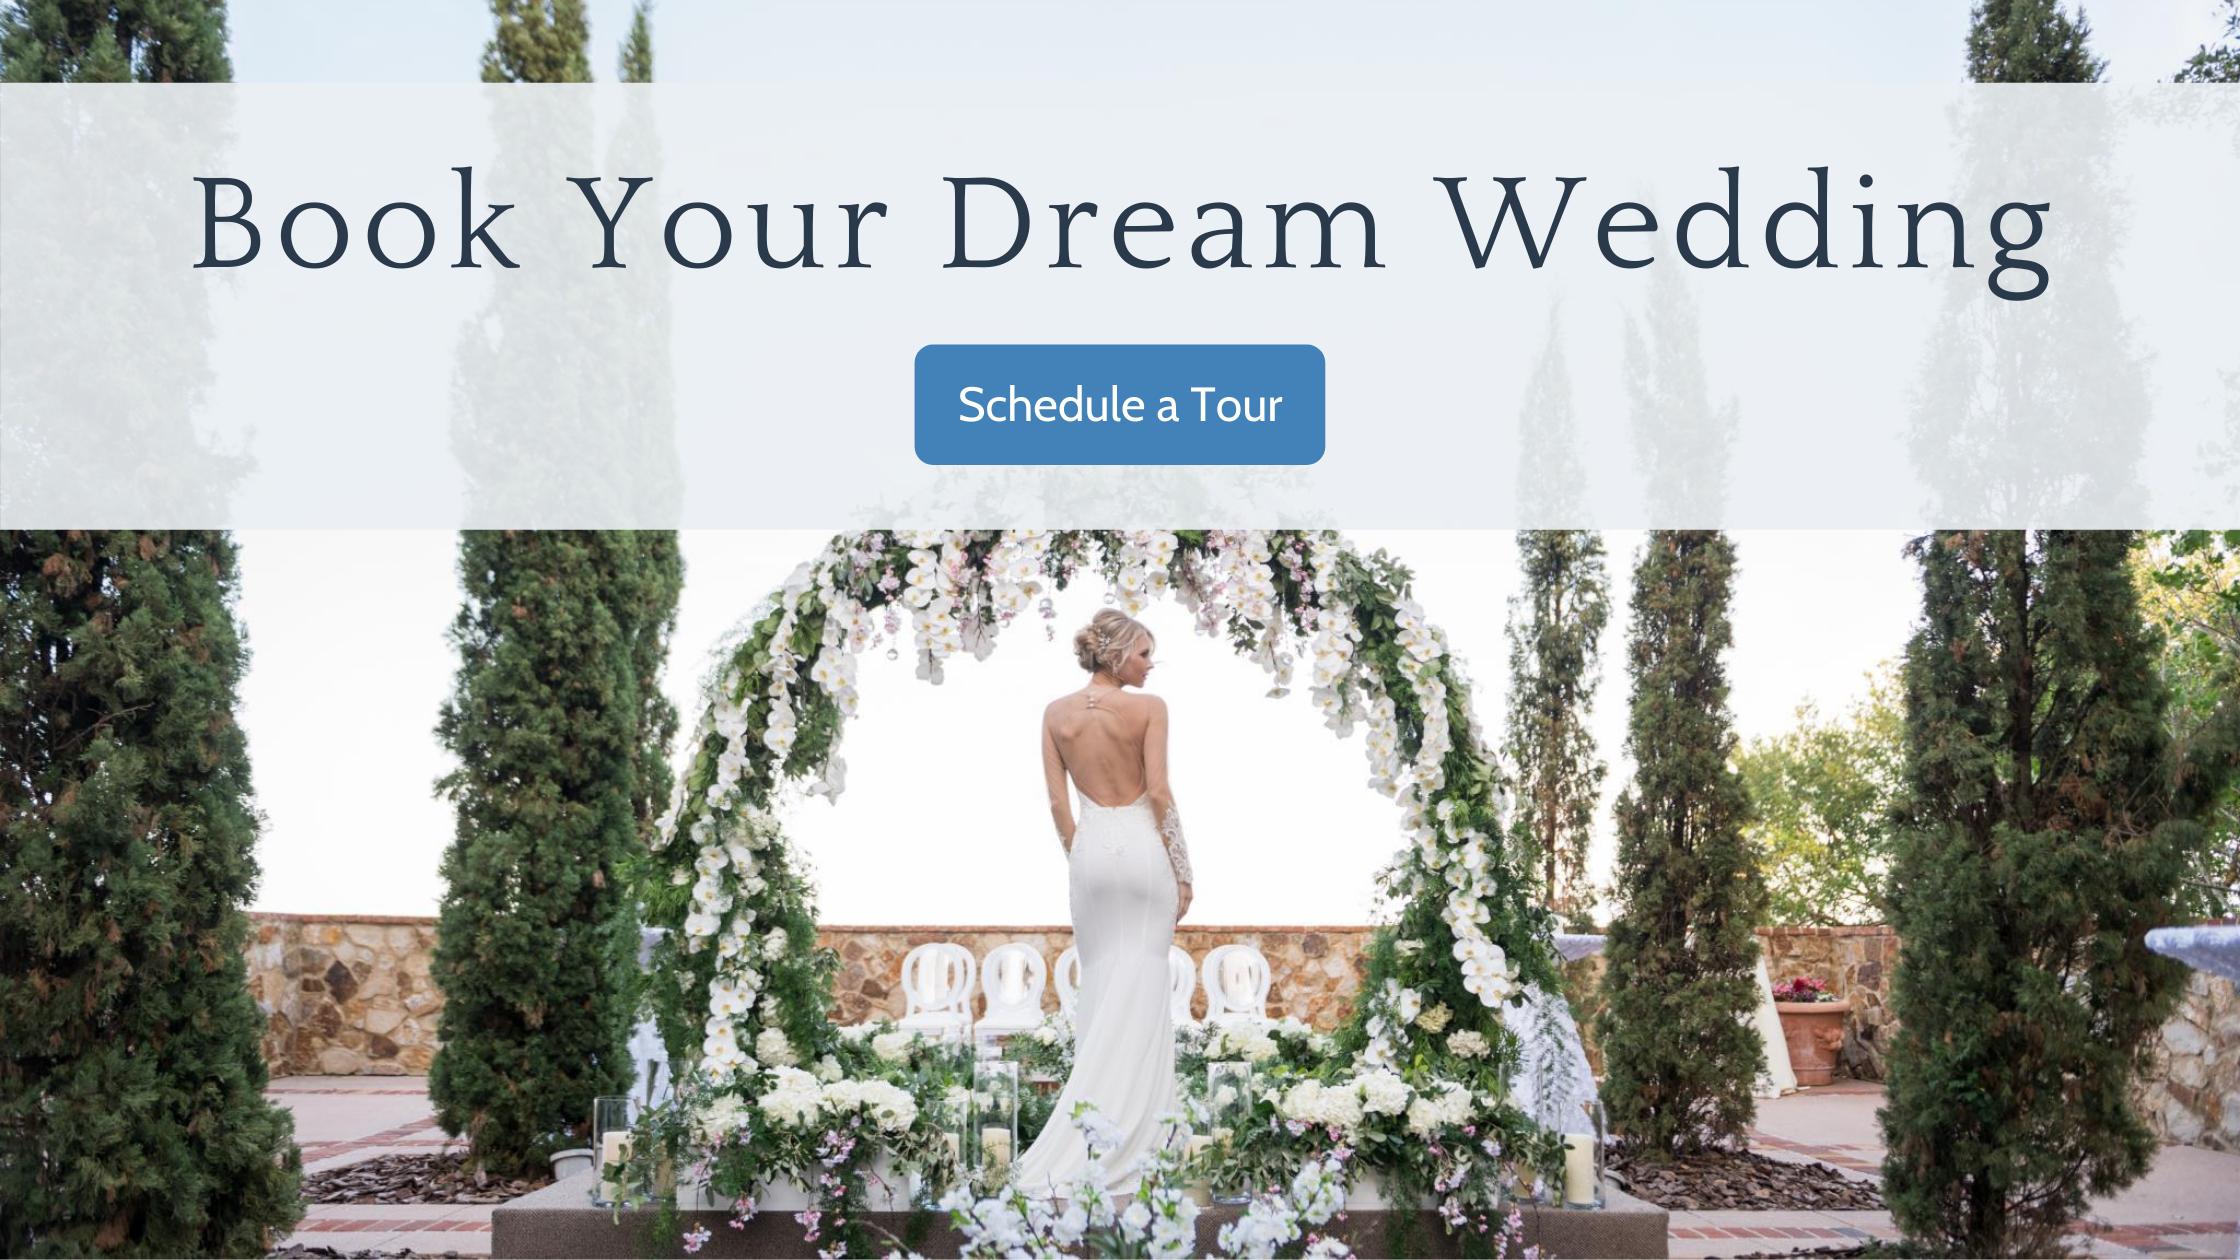 Book Your Dream Wedding - Schedule a Tour